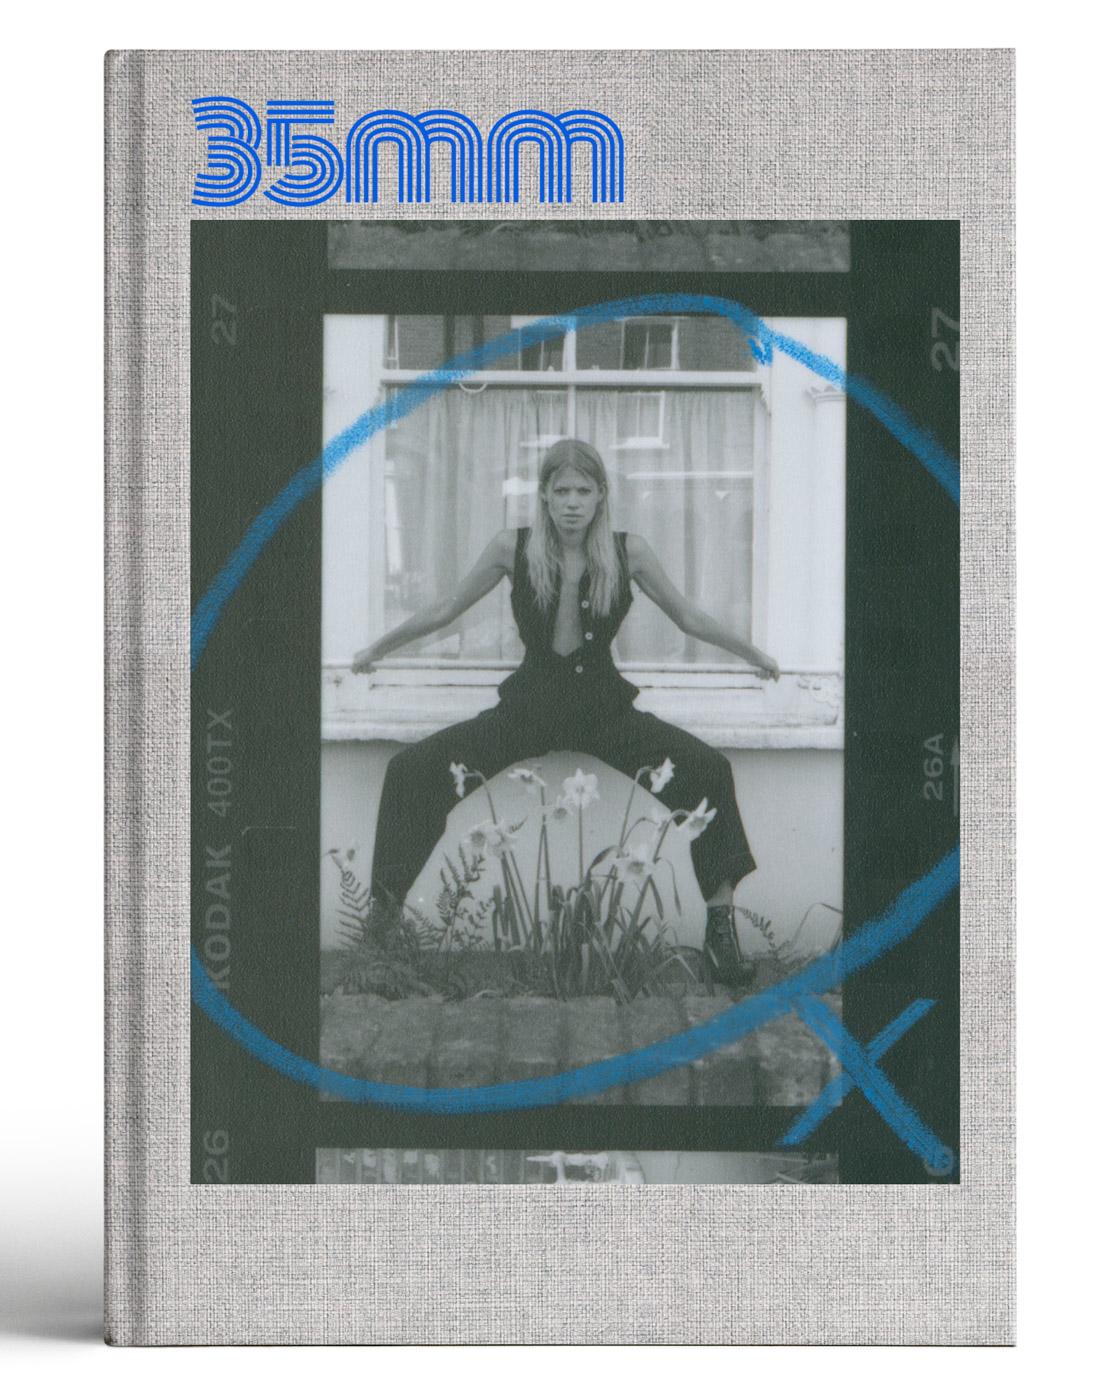 35mm_magazine_book_issue_film_only25.jpg